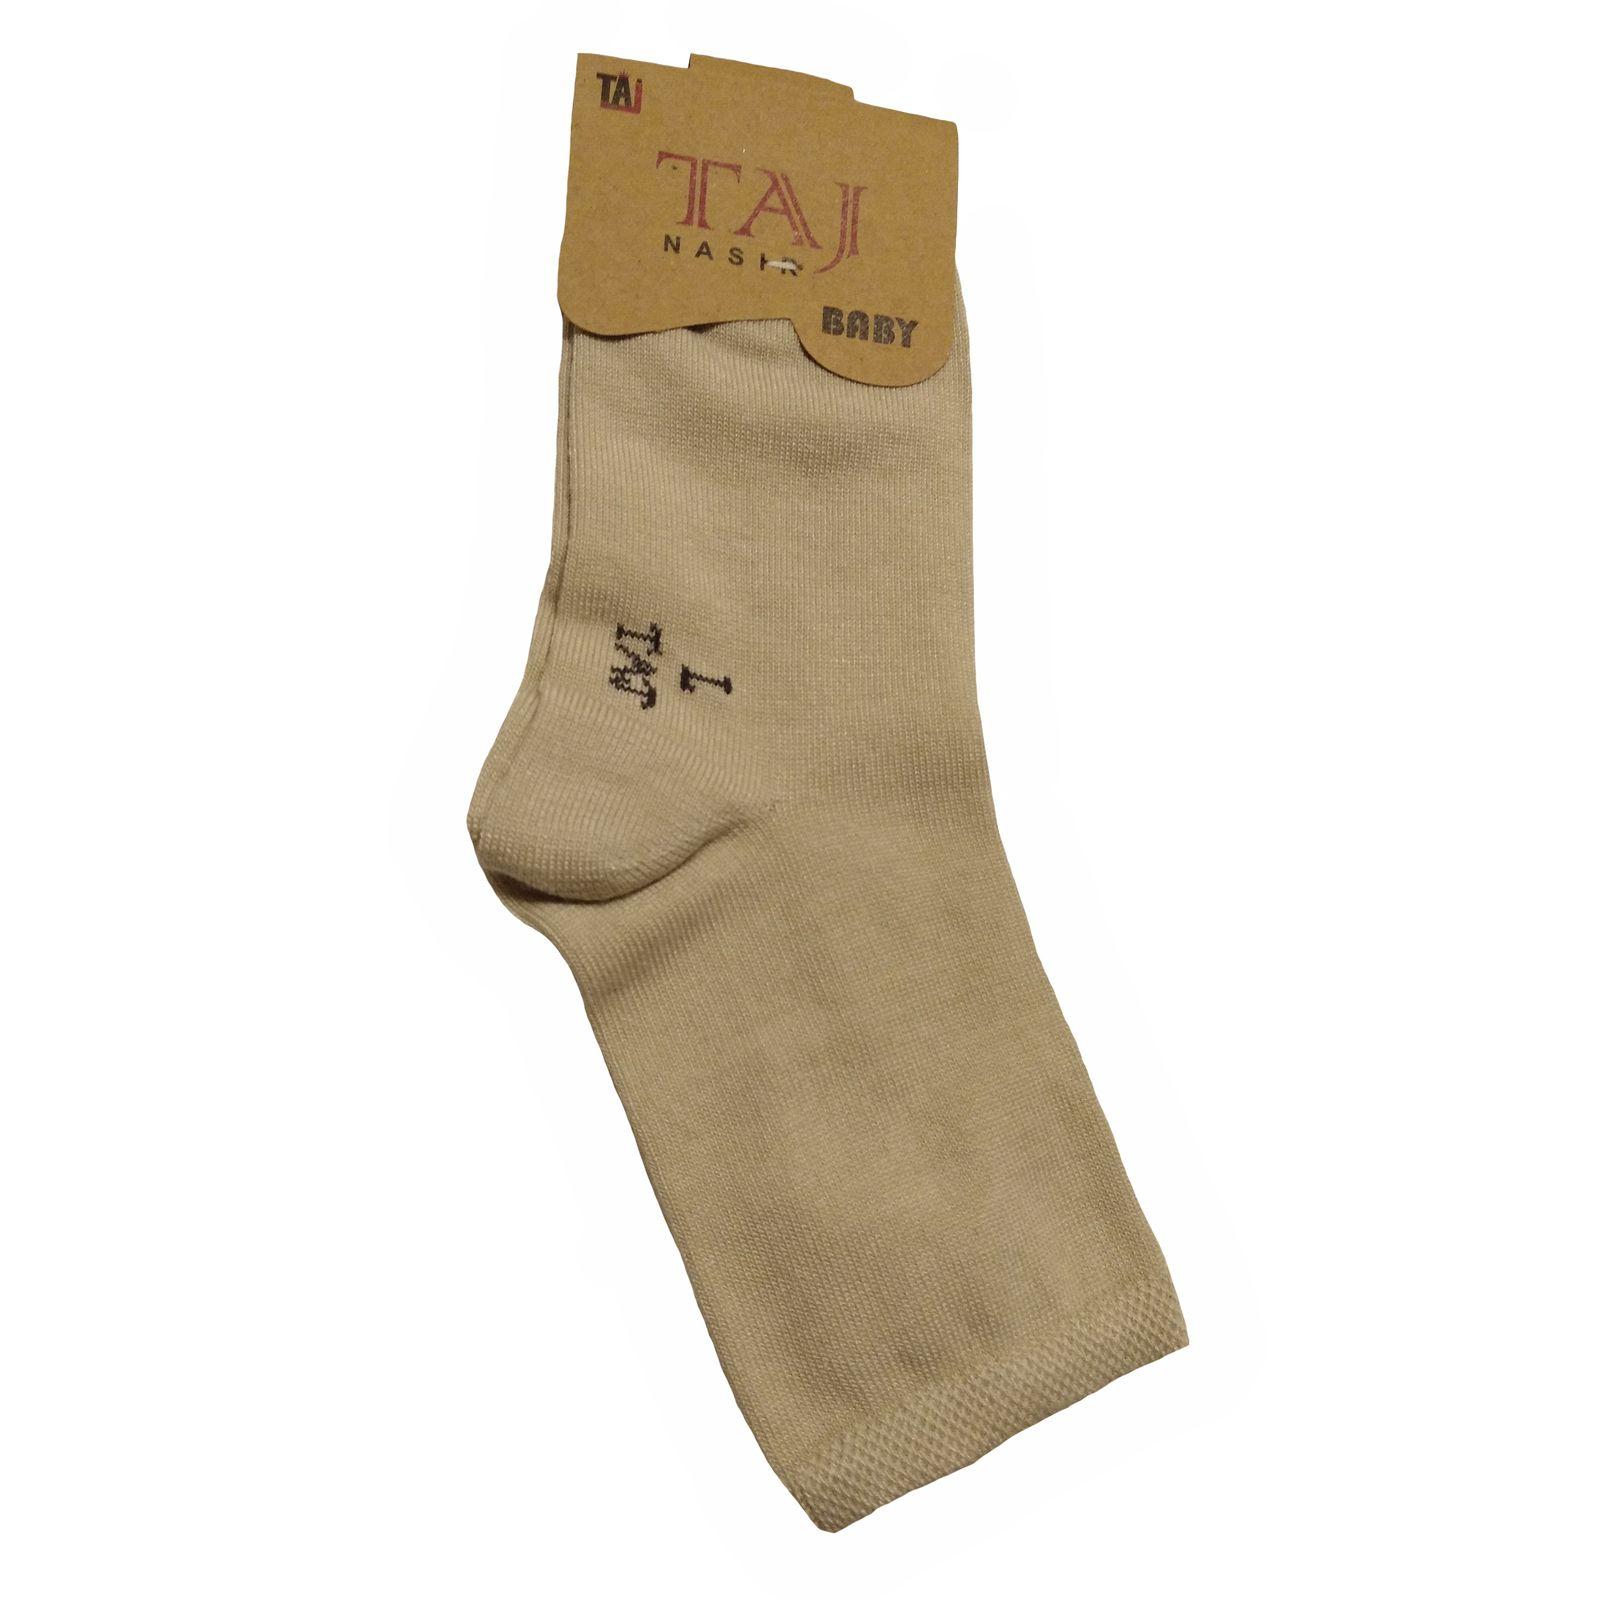 جوراب بچگانه تاج مدل P-2 -  - 2